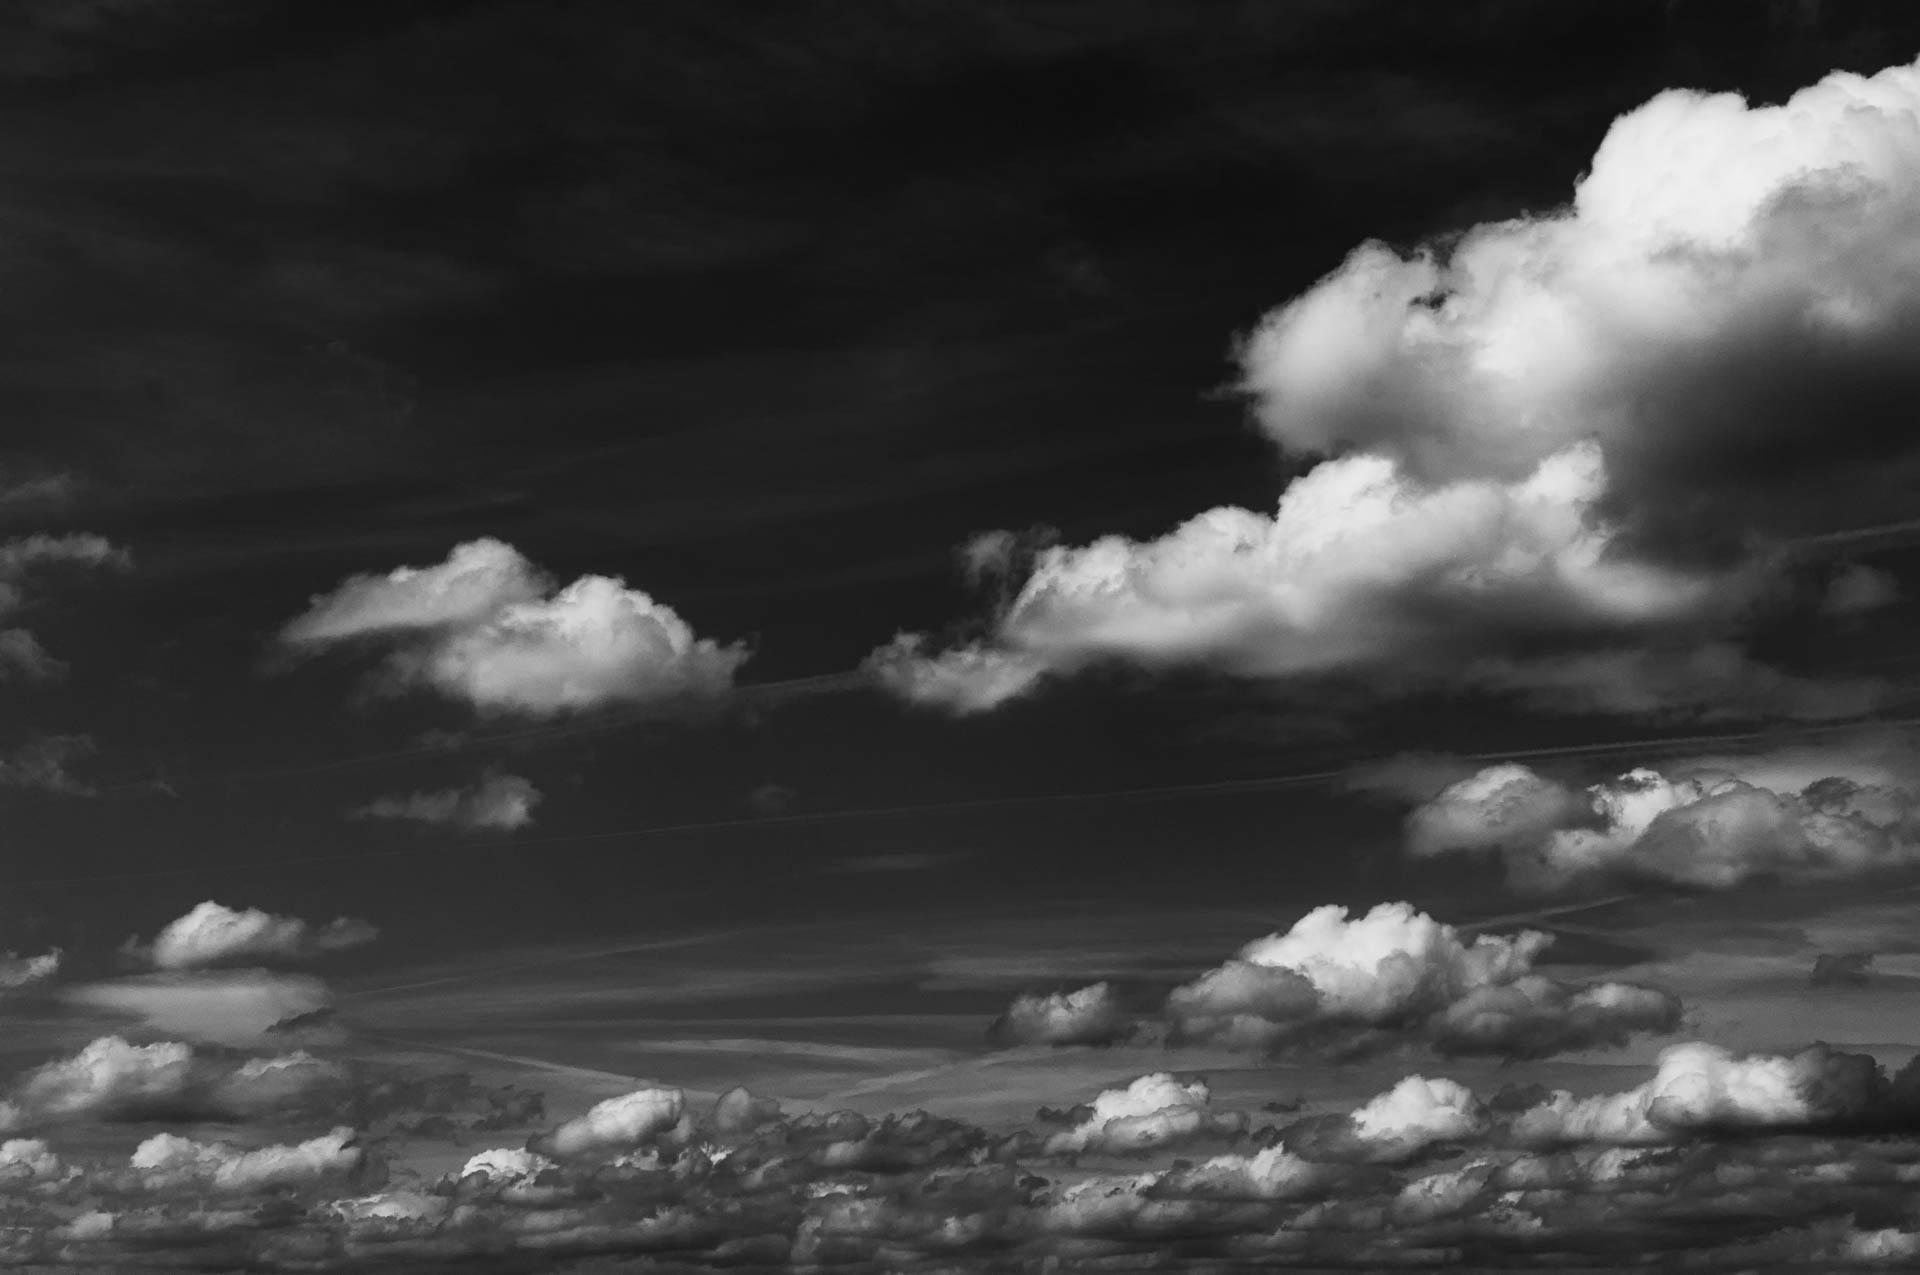 Nikon D300 - Wolkenbilder